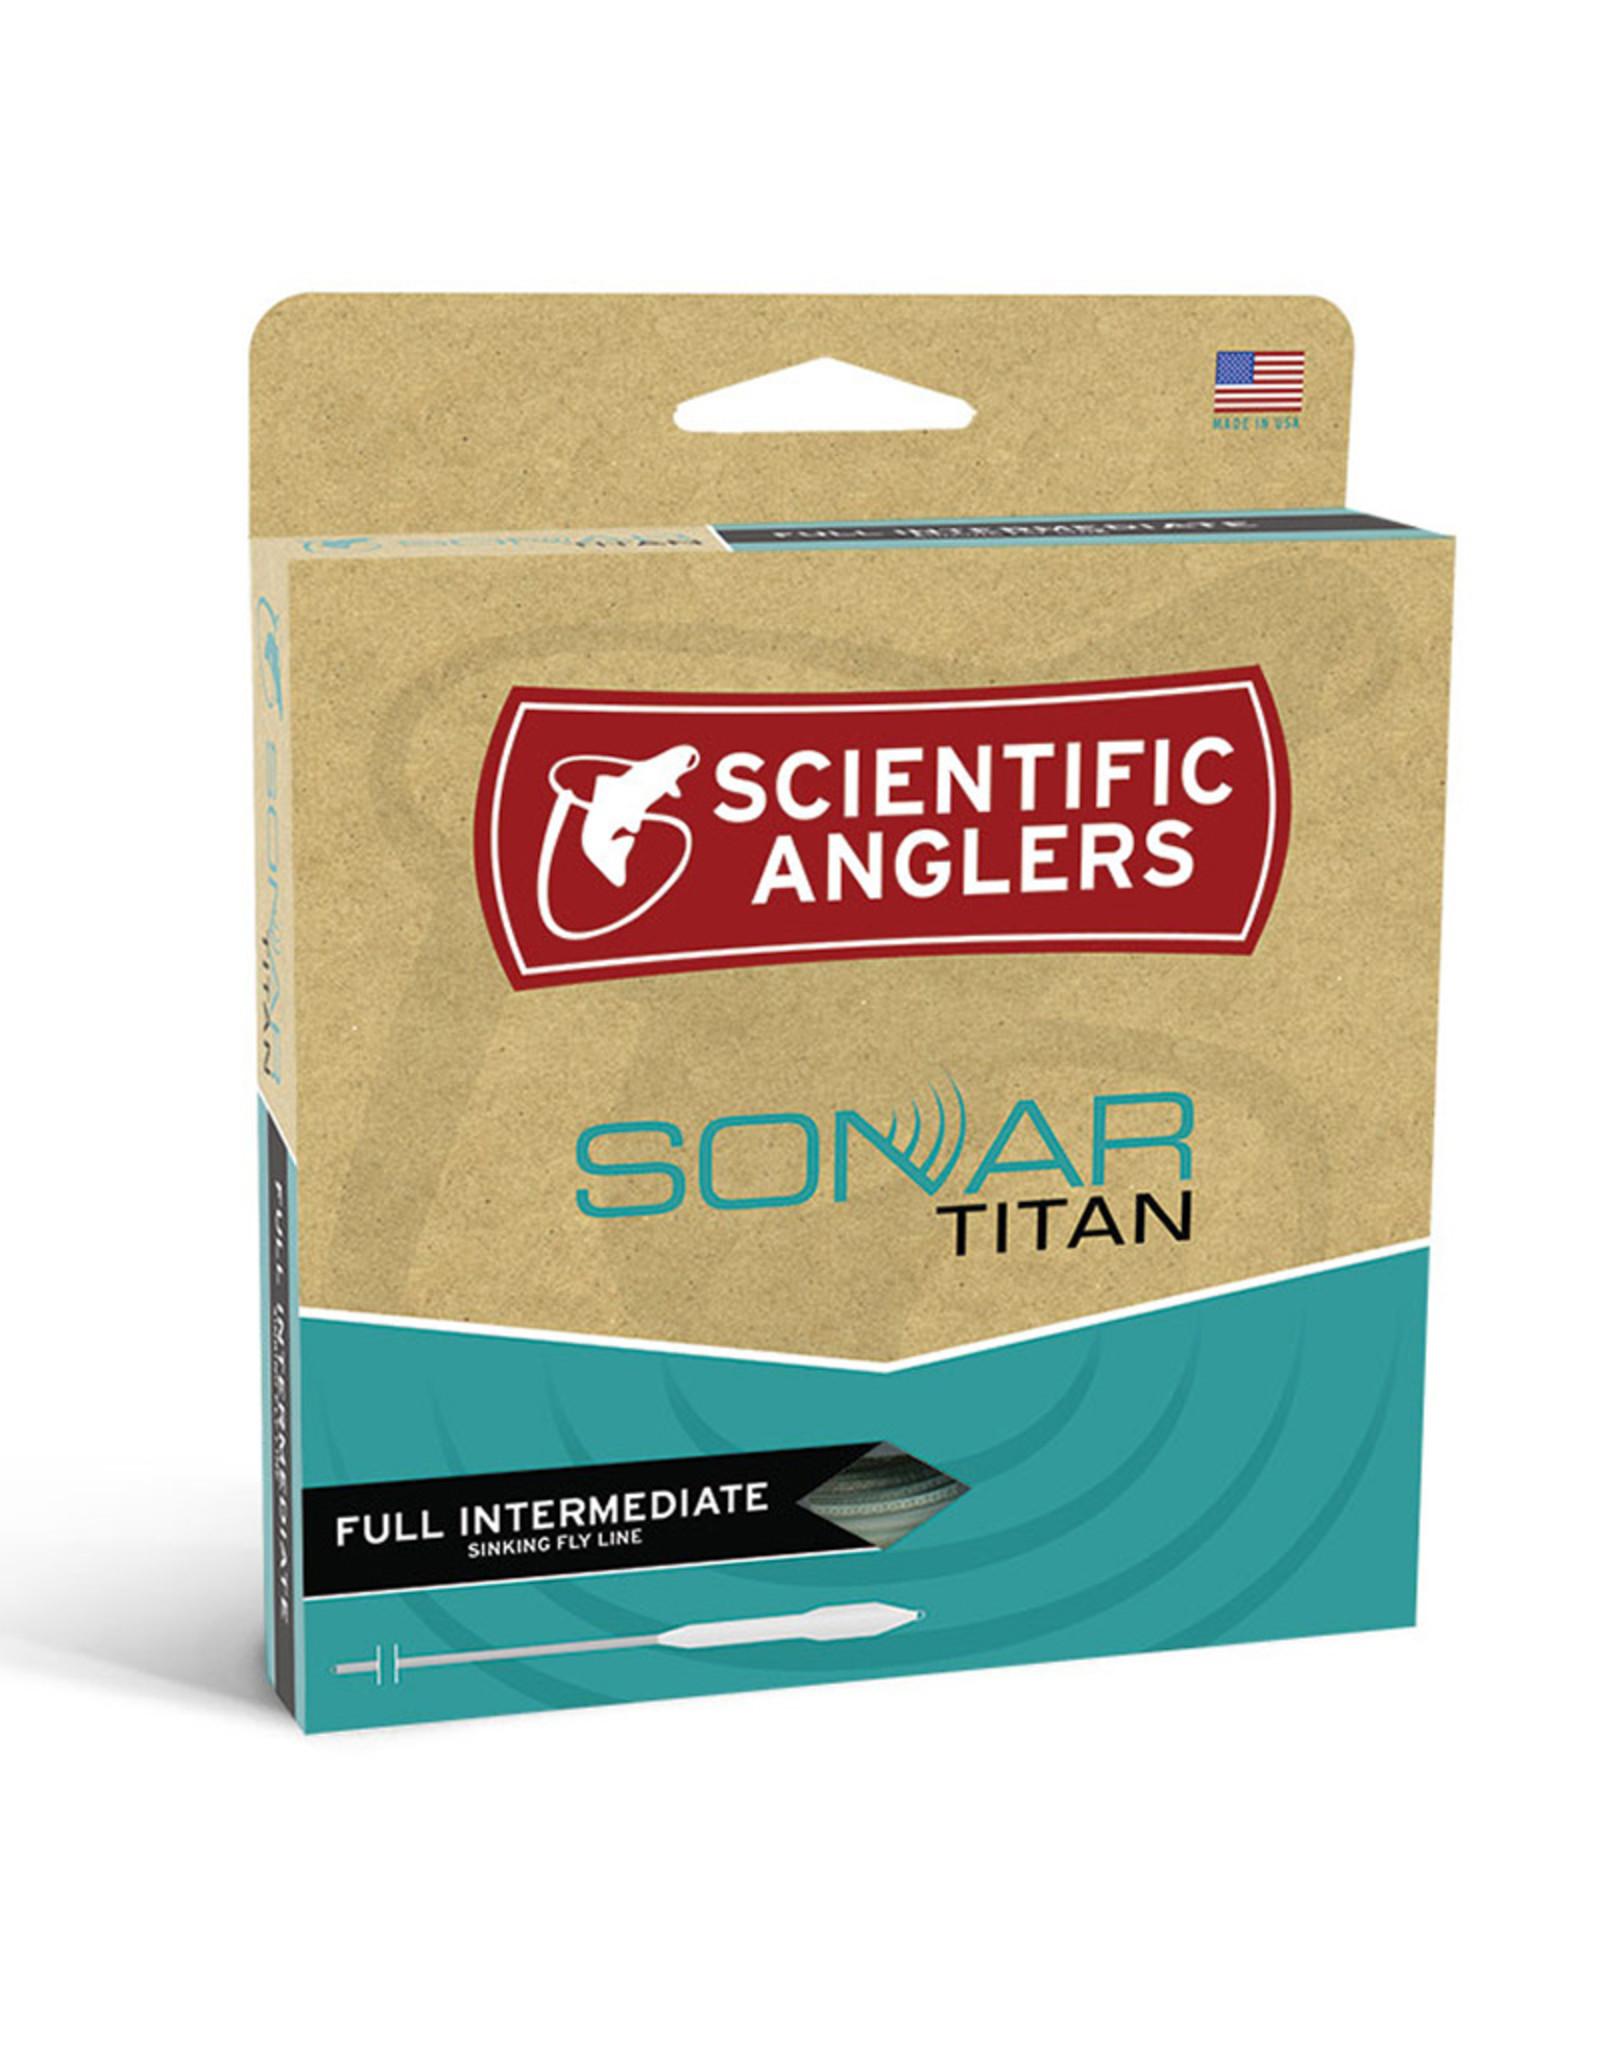 Scientific Anglers Sonar Titan Full Intermediate